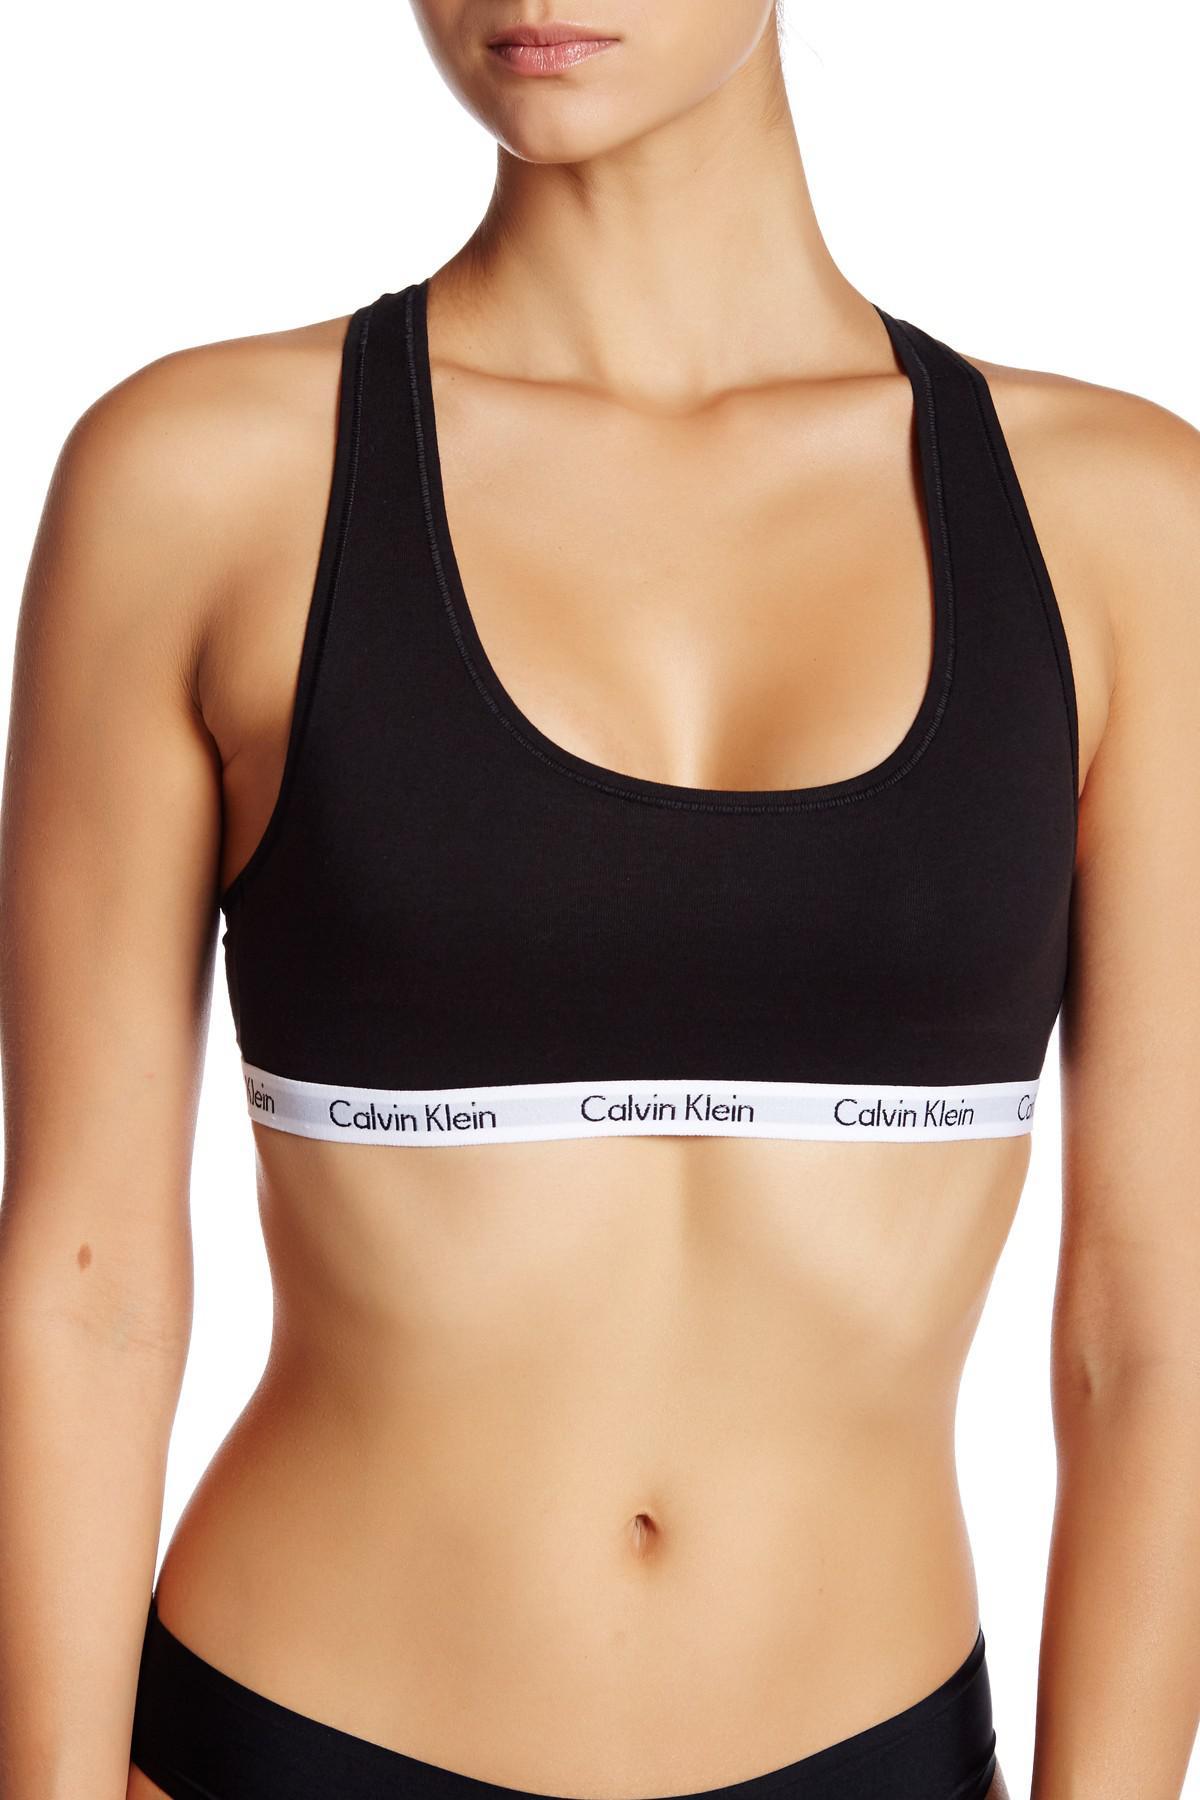 cec32a0af1 Calvin Klein - Black Carousel Racerback Bralette - Lyst. View fullscreen